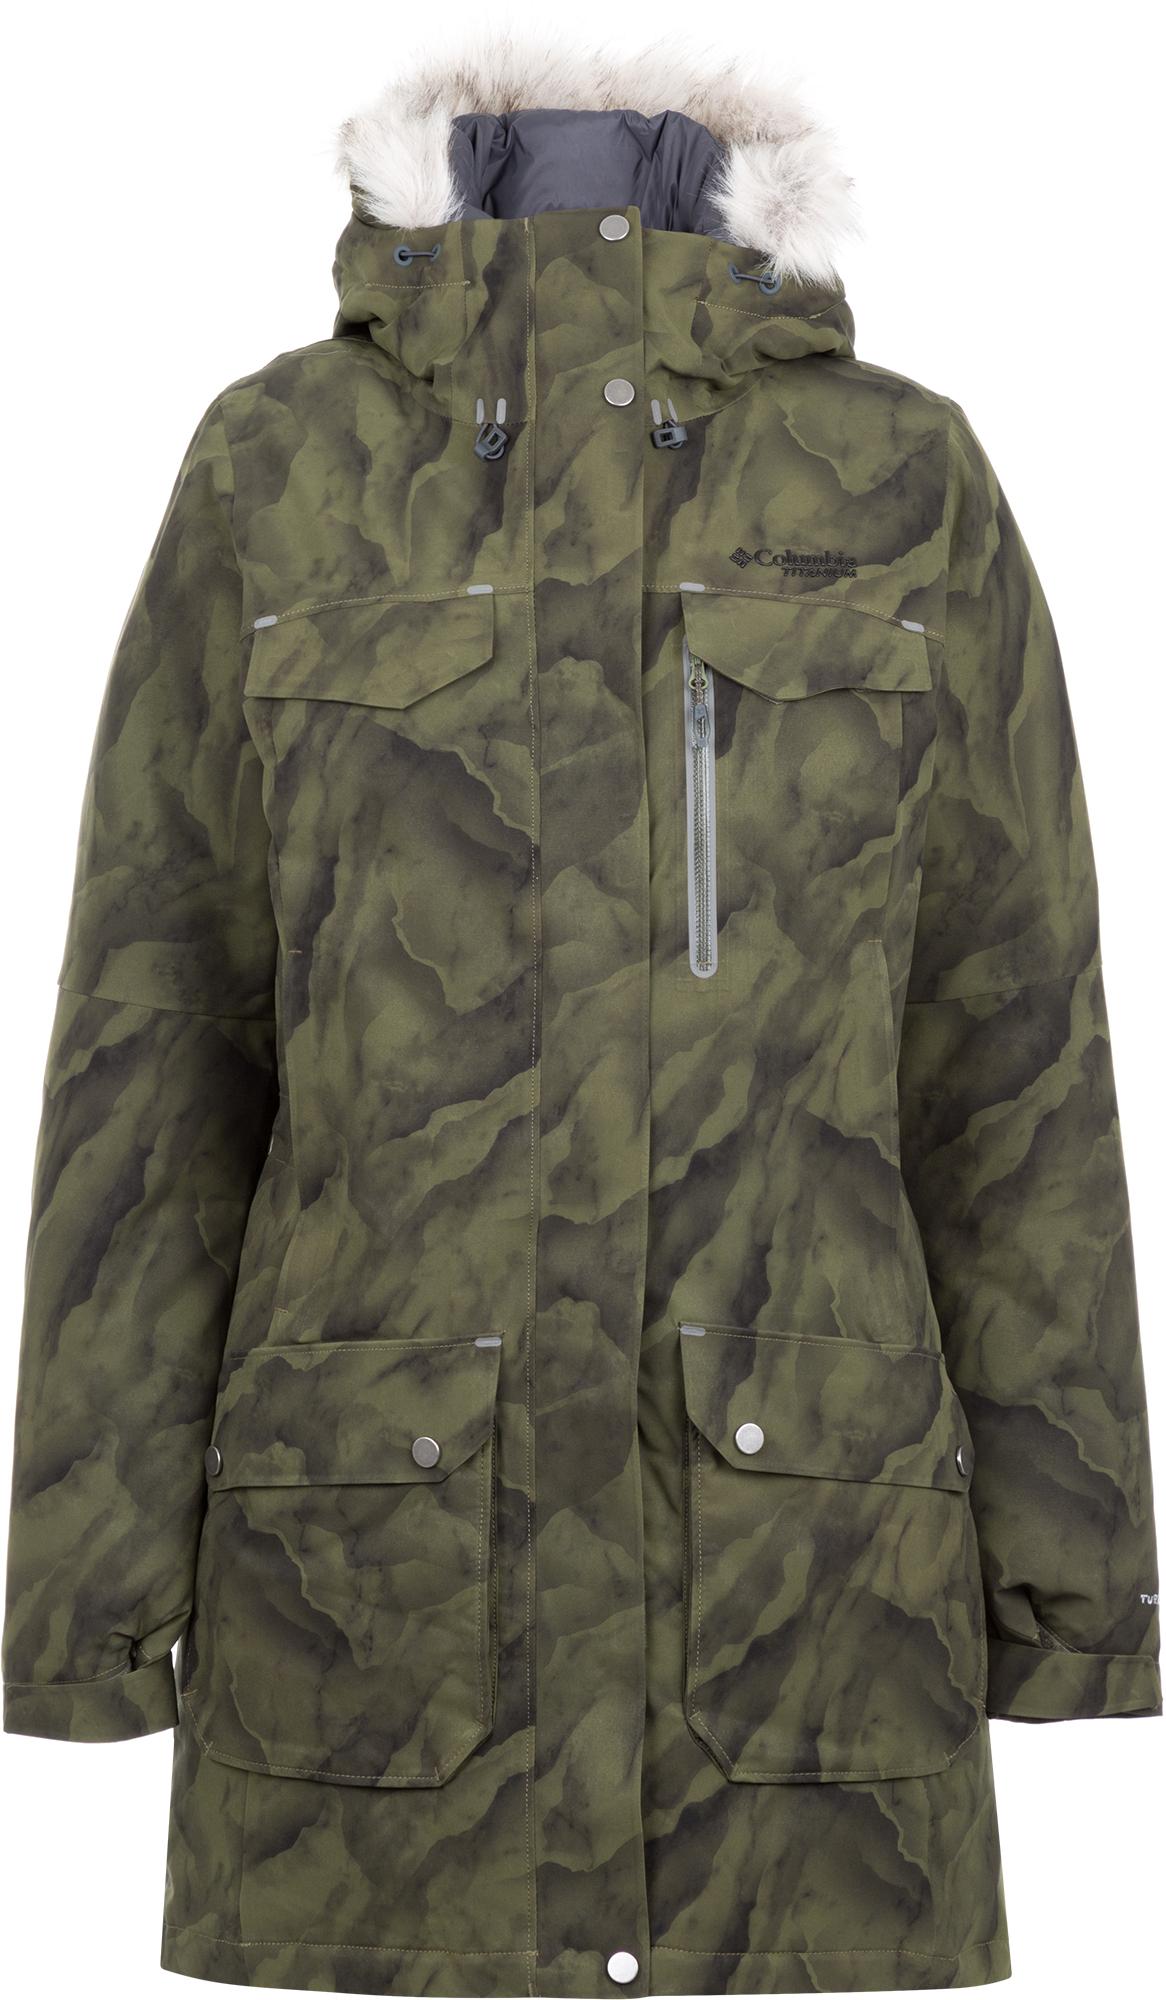 Columbia Куртка пуховая женская Columbia Titan Pass 780 TurboDown, размер 48 pajar куртка пуховая женская cougar xl jet black